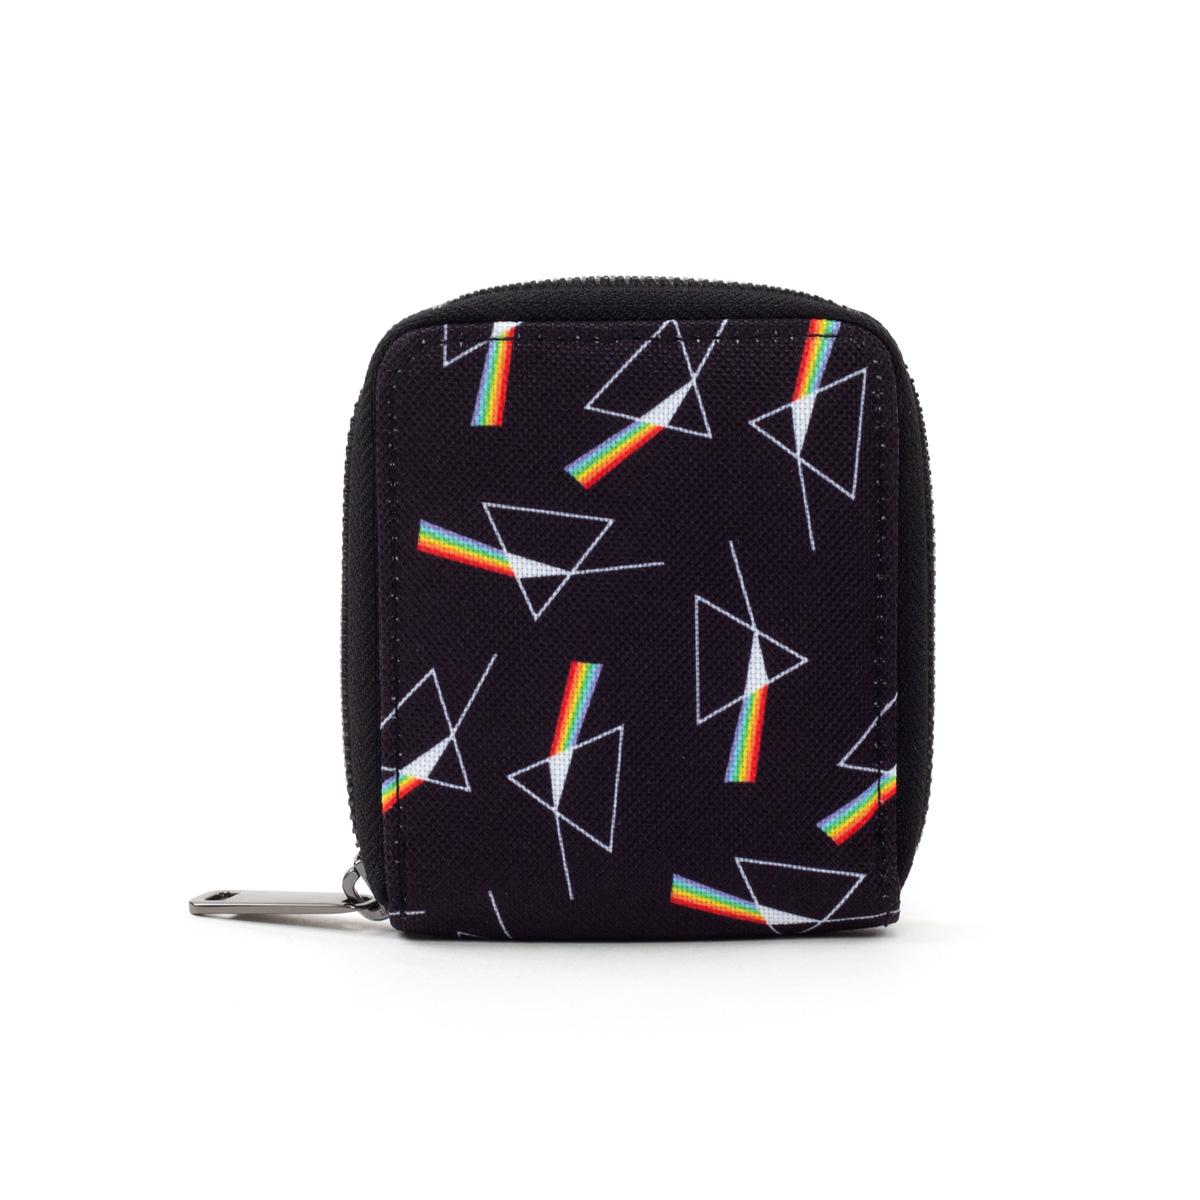 Pink Floyd The Dark Side of the Moon Zipper Wallet